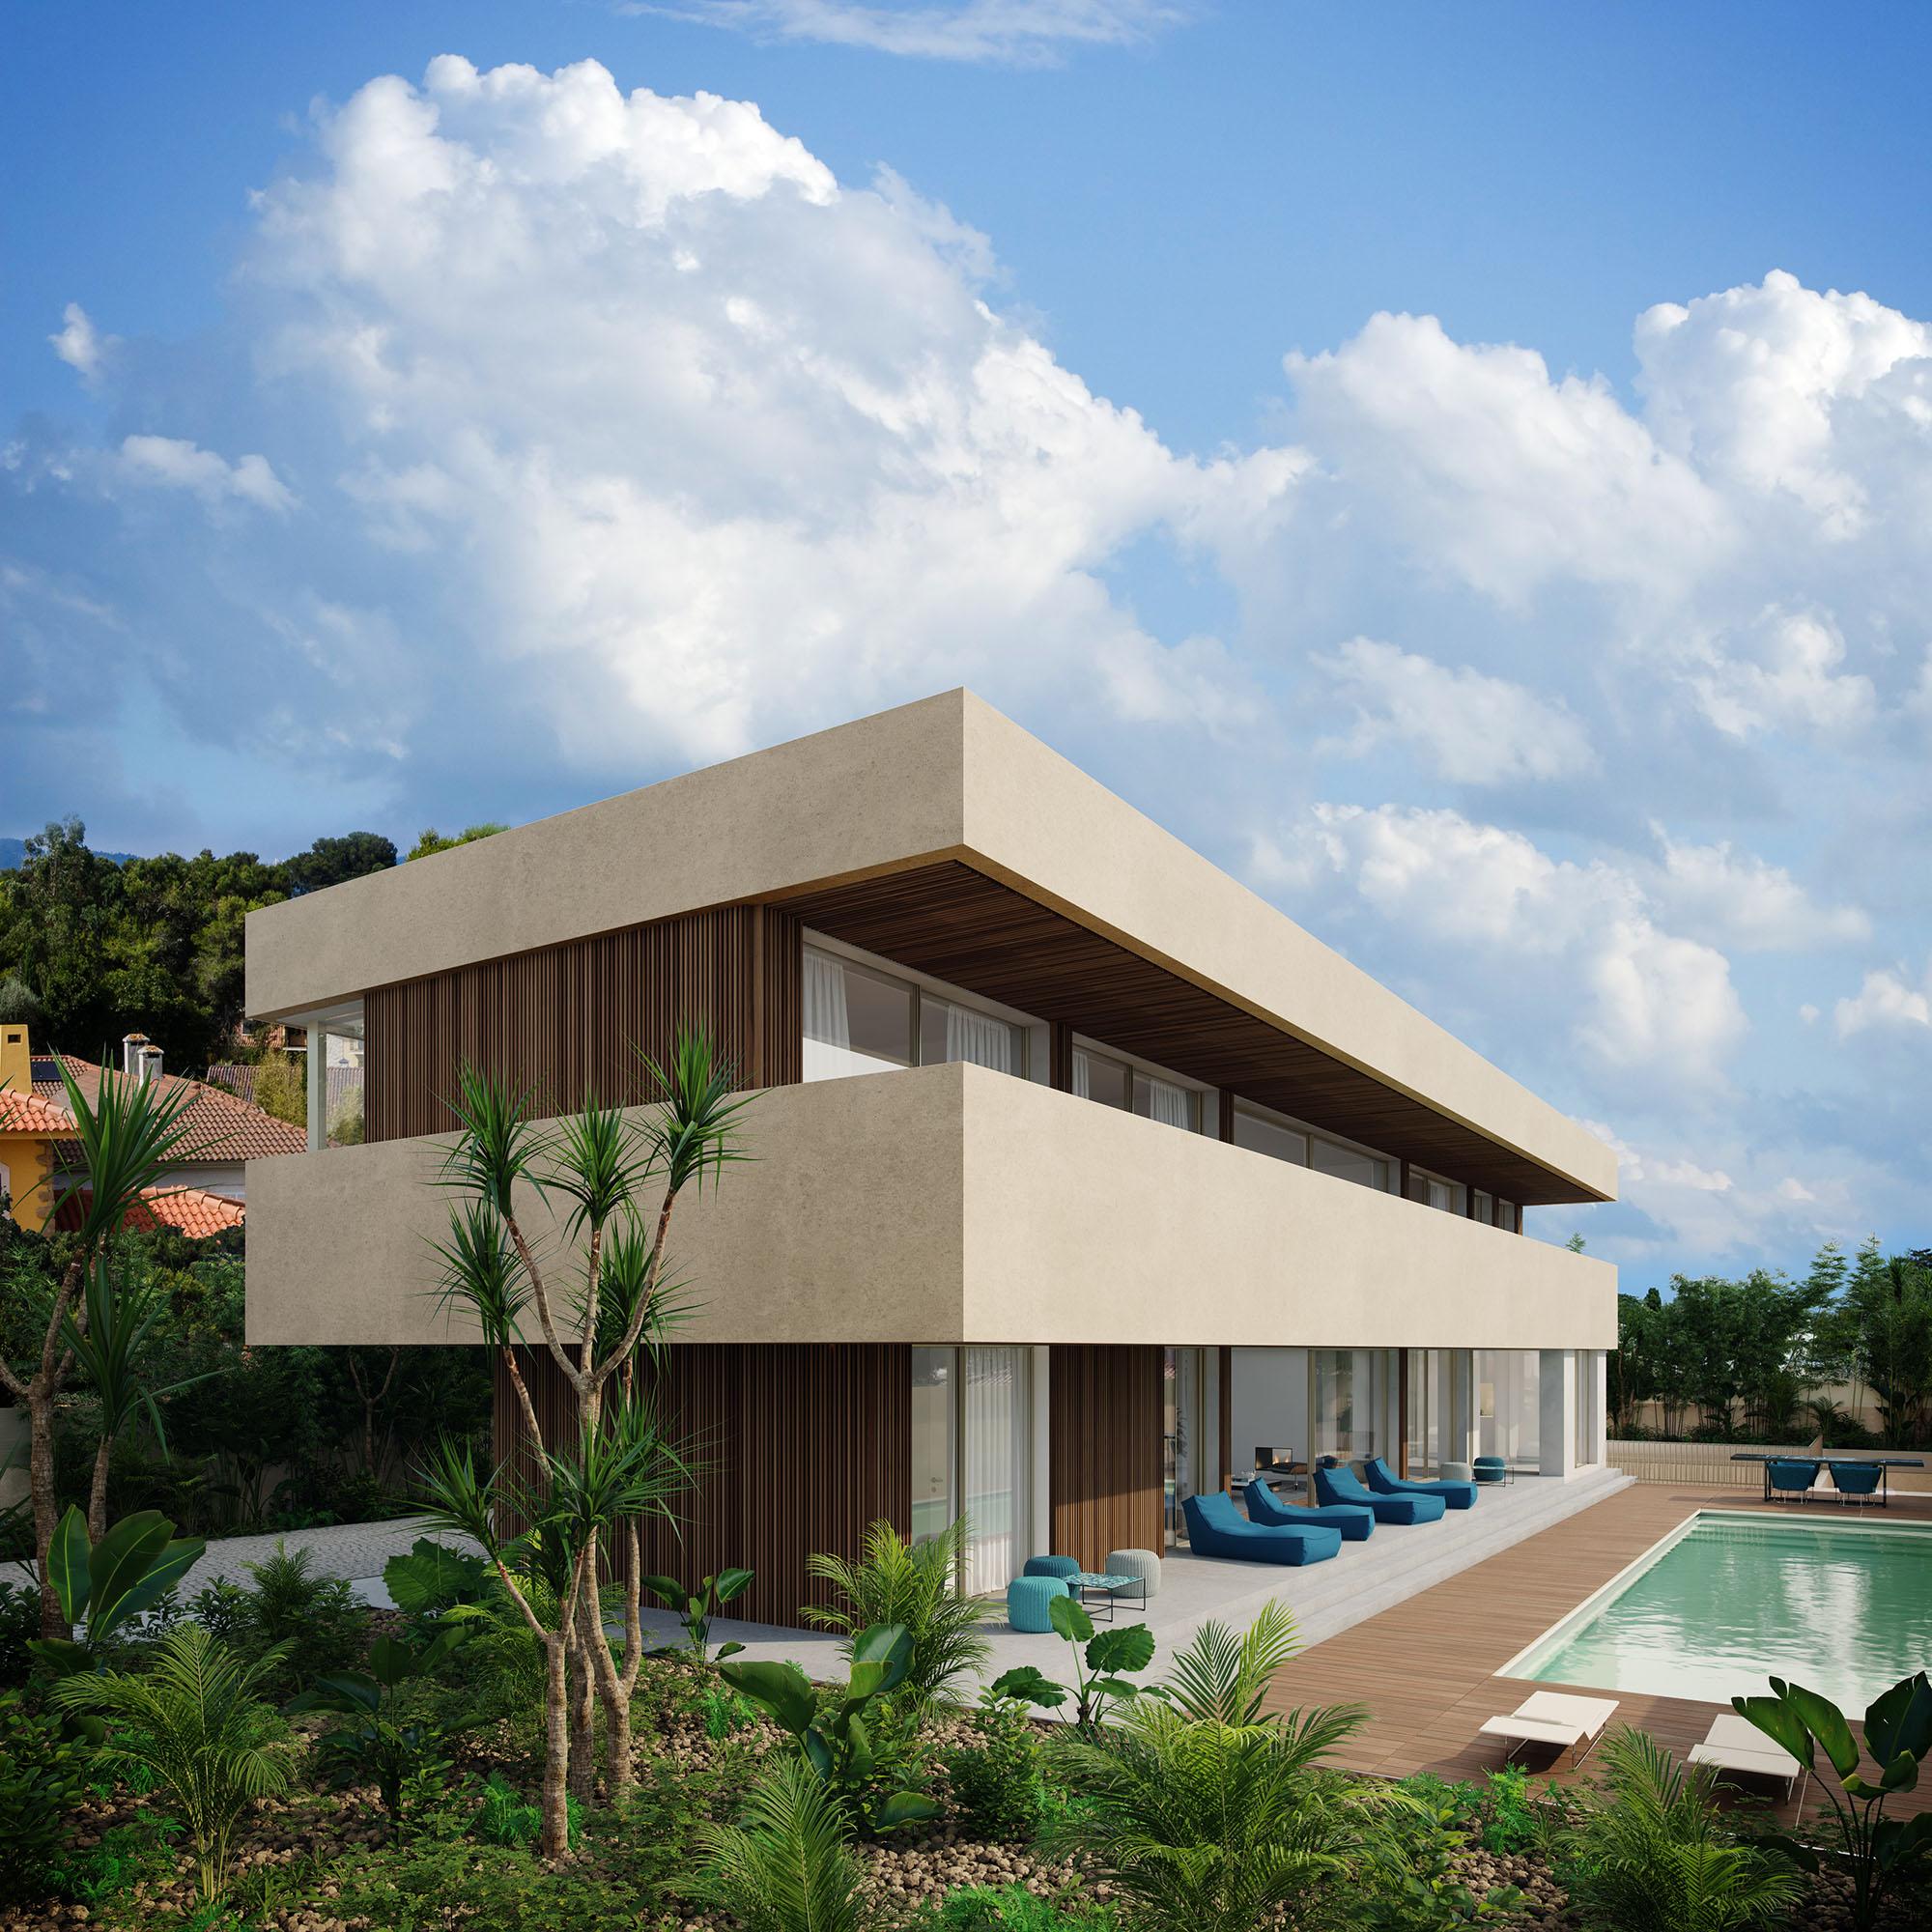 Casa das Alcachofras